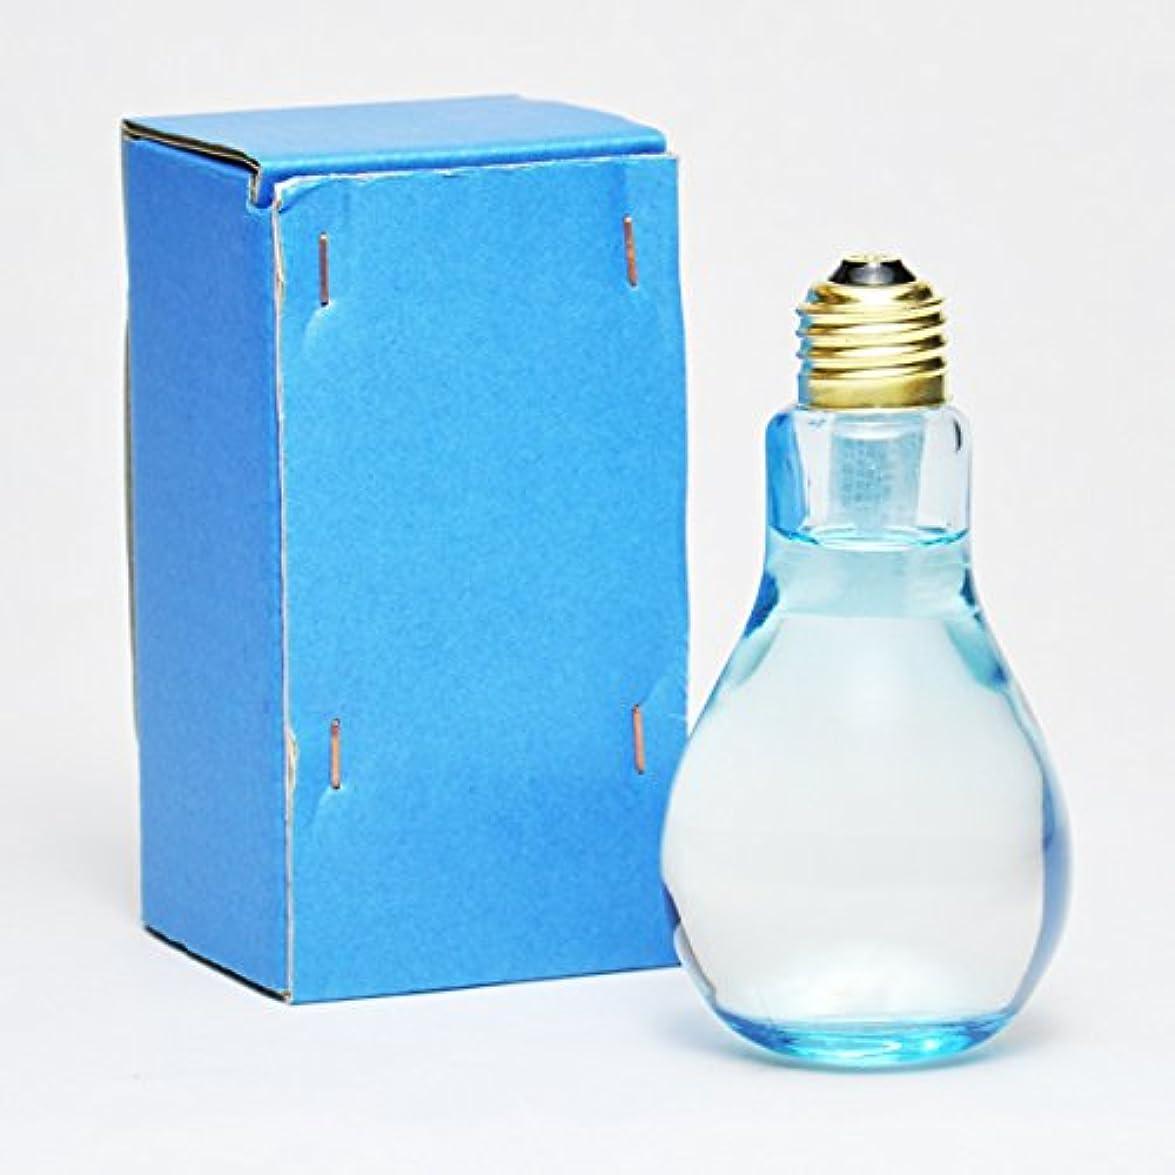 コイル踏み台テナント電球酒 三朝正宗 上撰 原酒 180ml 1本 青色 電球形 日本酒 鳥取 地酒